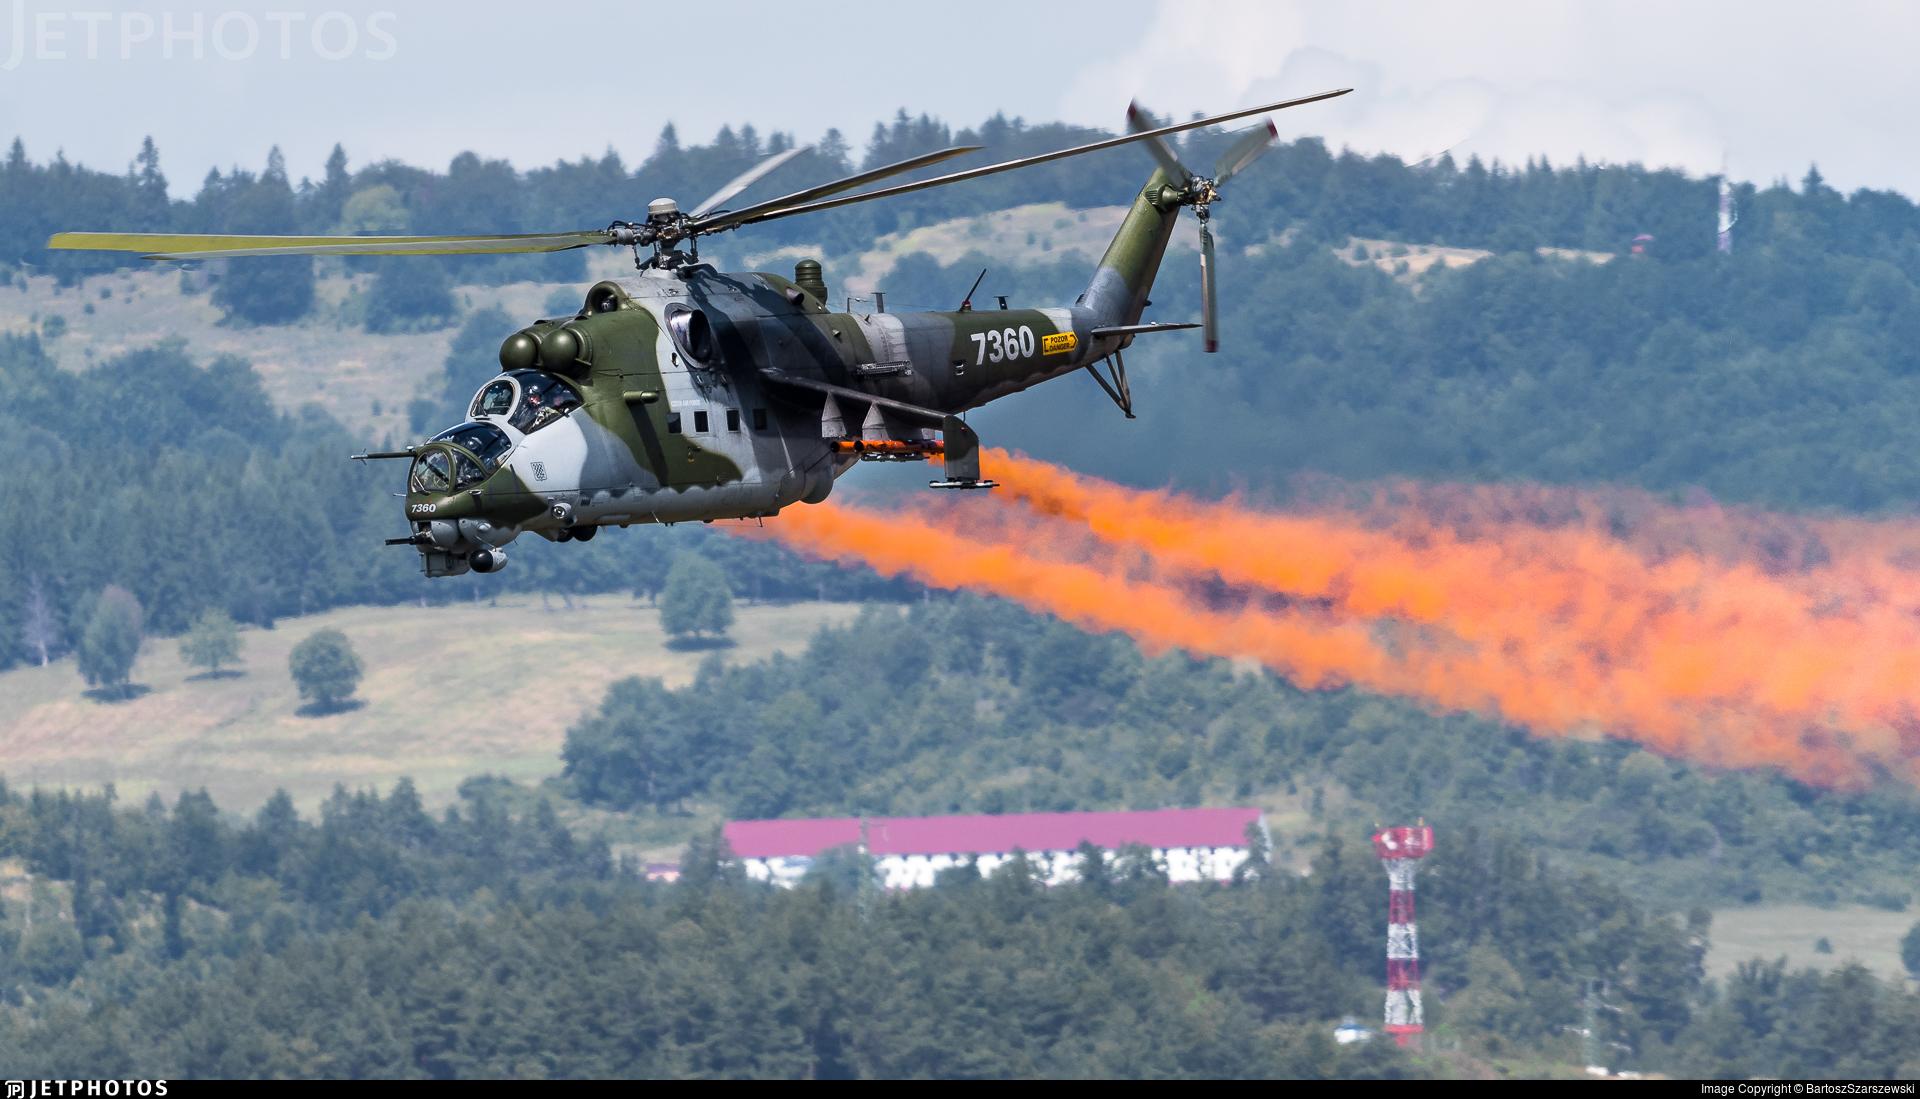 7360 - Mil Mi-35M Hind - Czech Republic - Air Force